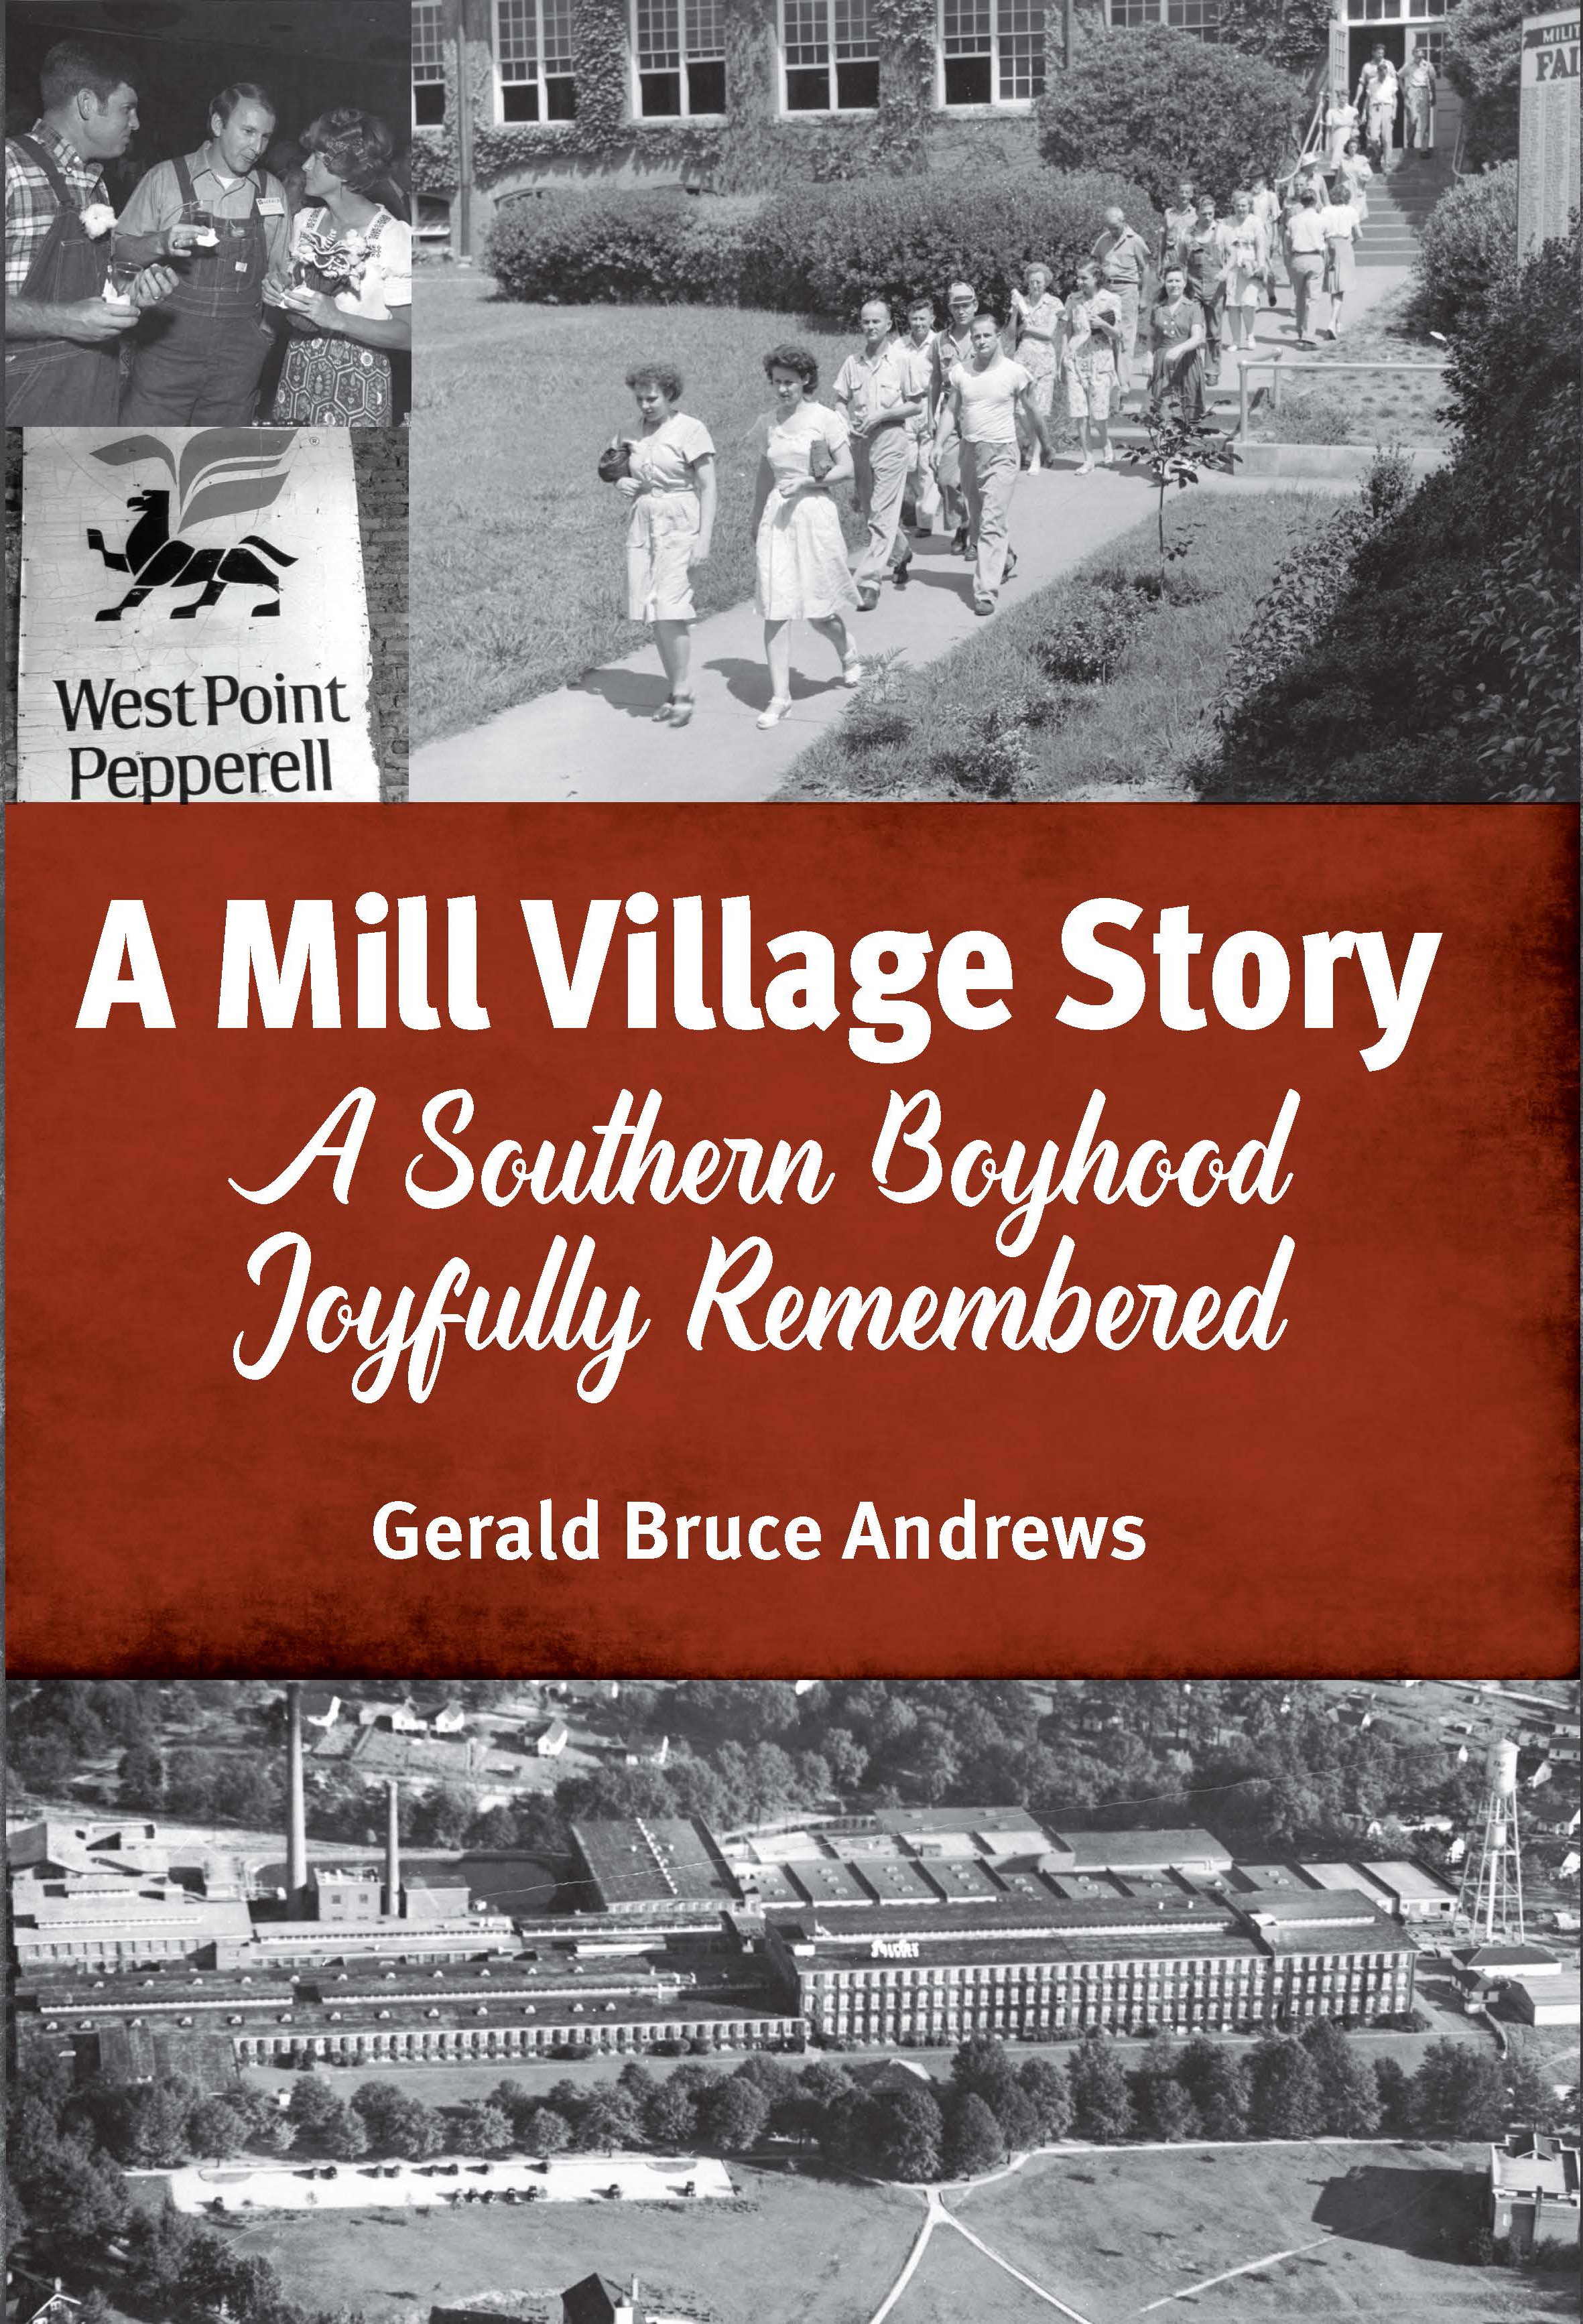 A Mill Village Story